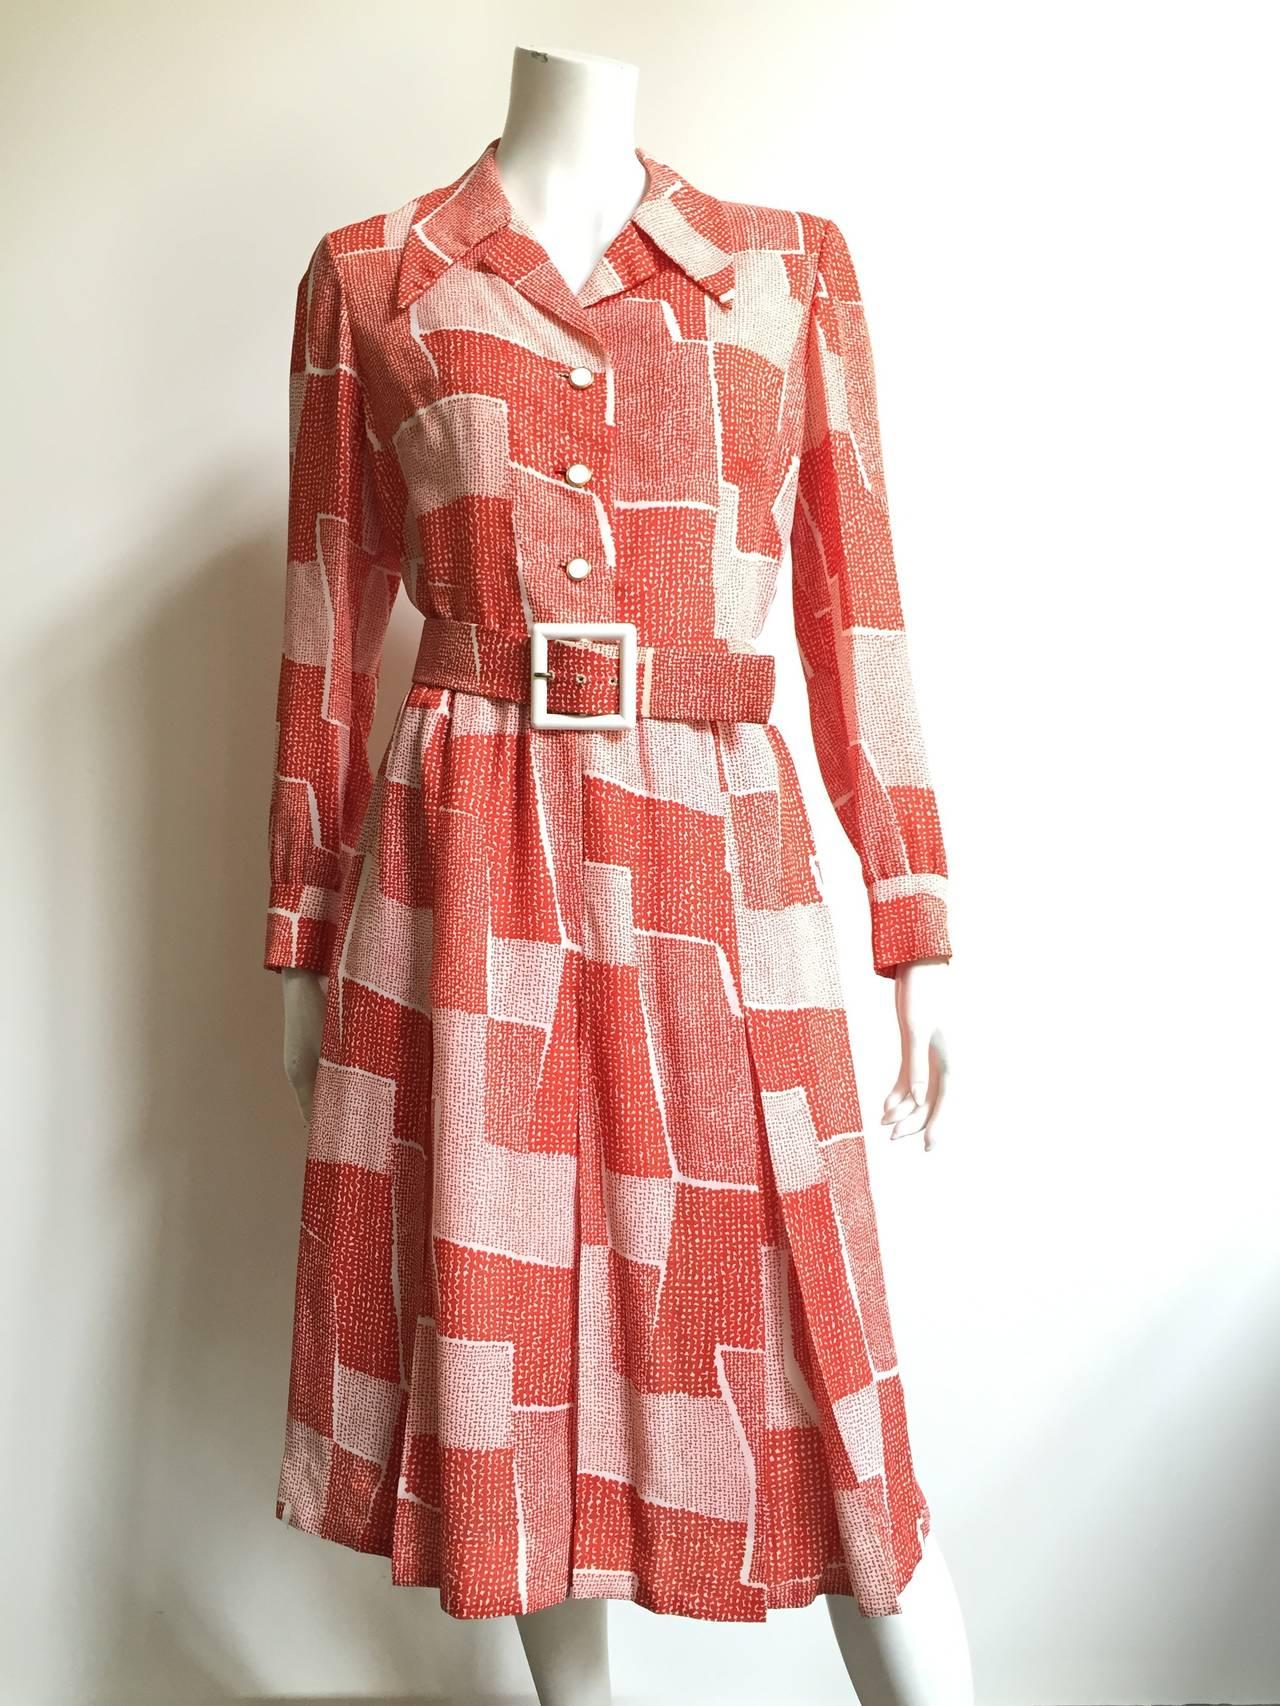 Adele Simpson 70s Dress Size 8. 10